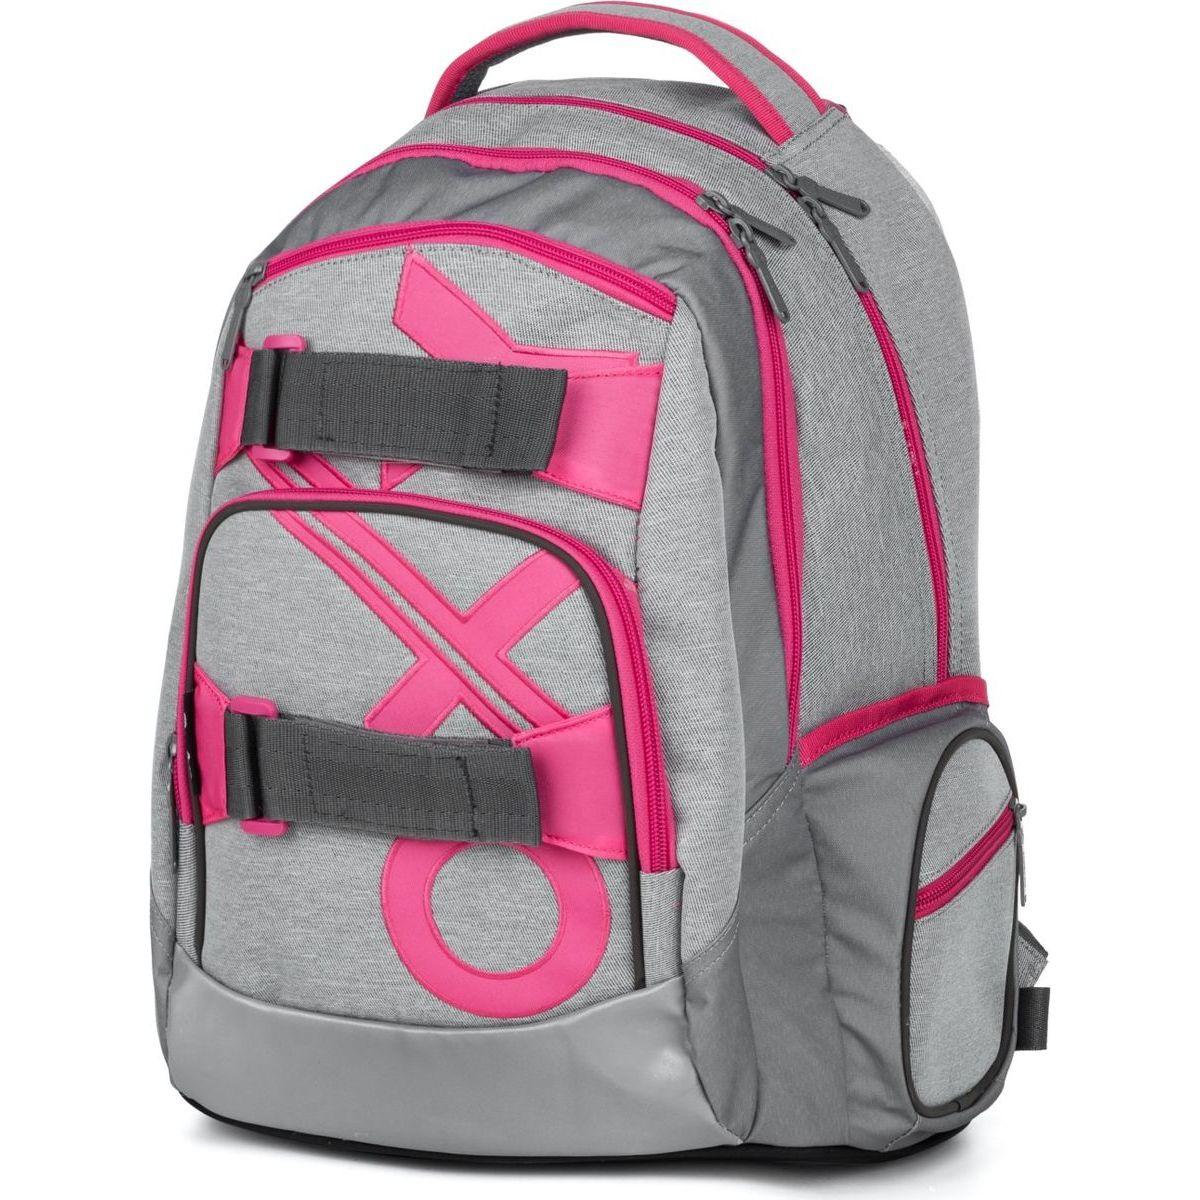 Karton P + P Školský batoh Oxy Style Mini pink